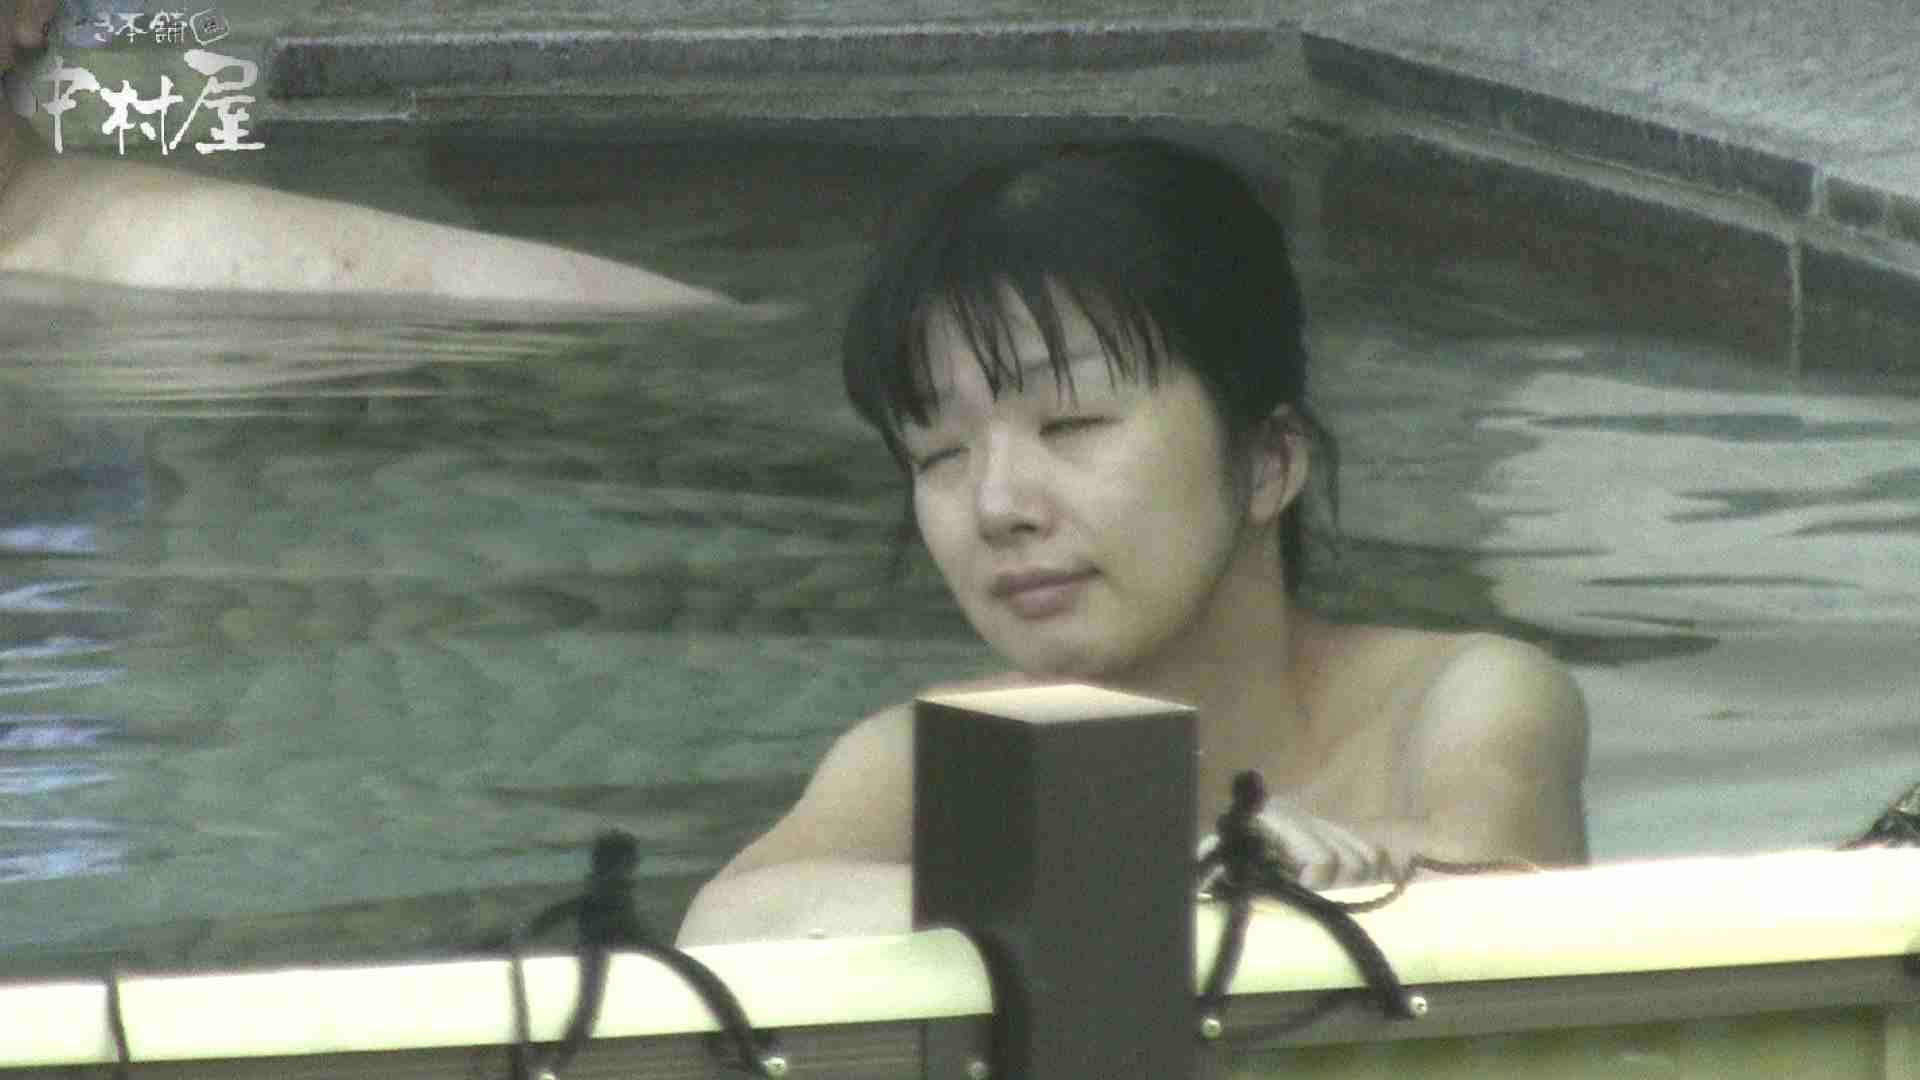 Aquaな露天風呂Vol.904 OL  60連発 32